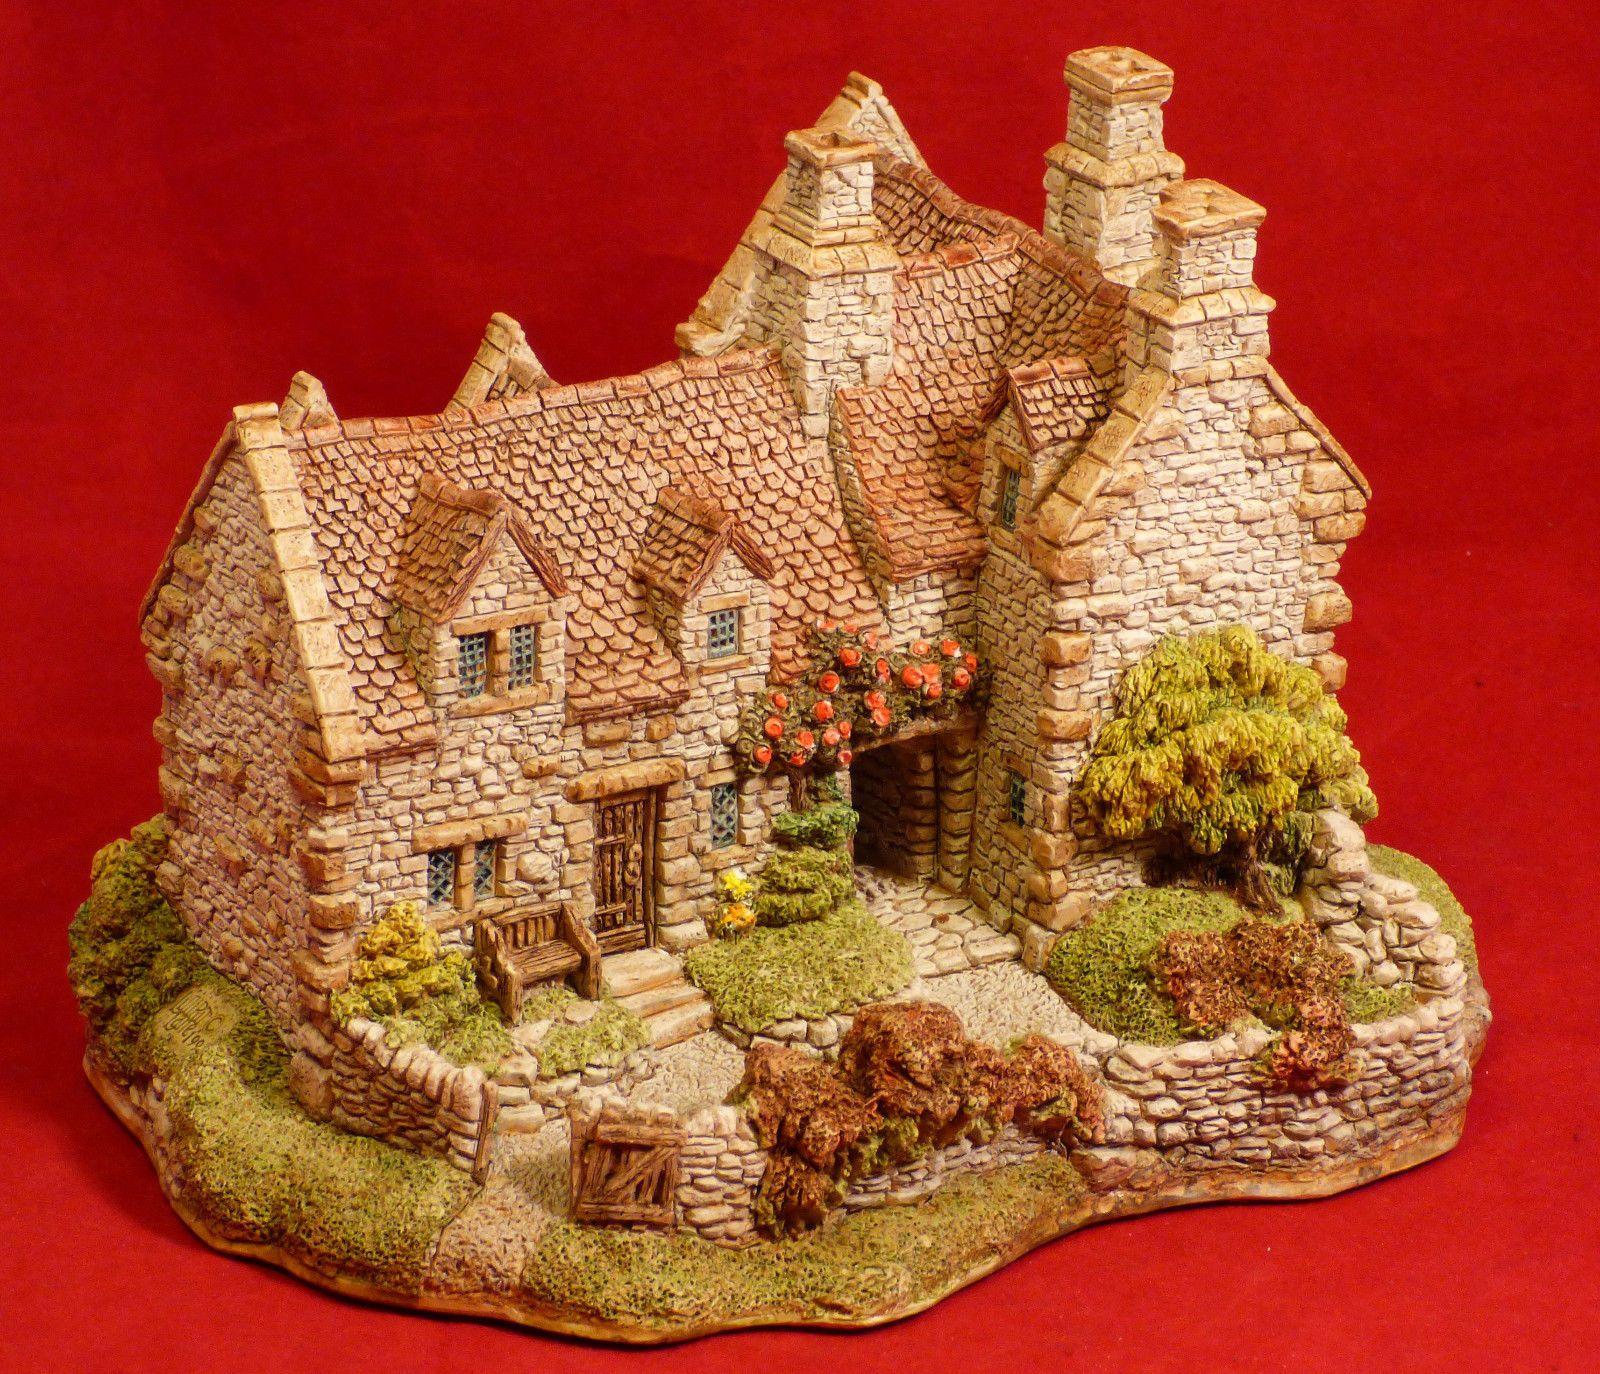 lilliput lane armada house miniature cottage mint with box england dreamy dreamy 9 3. Black Bedroom Furniture Sets. Home Design Ideas